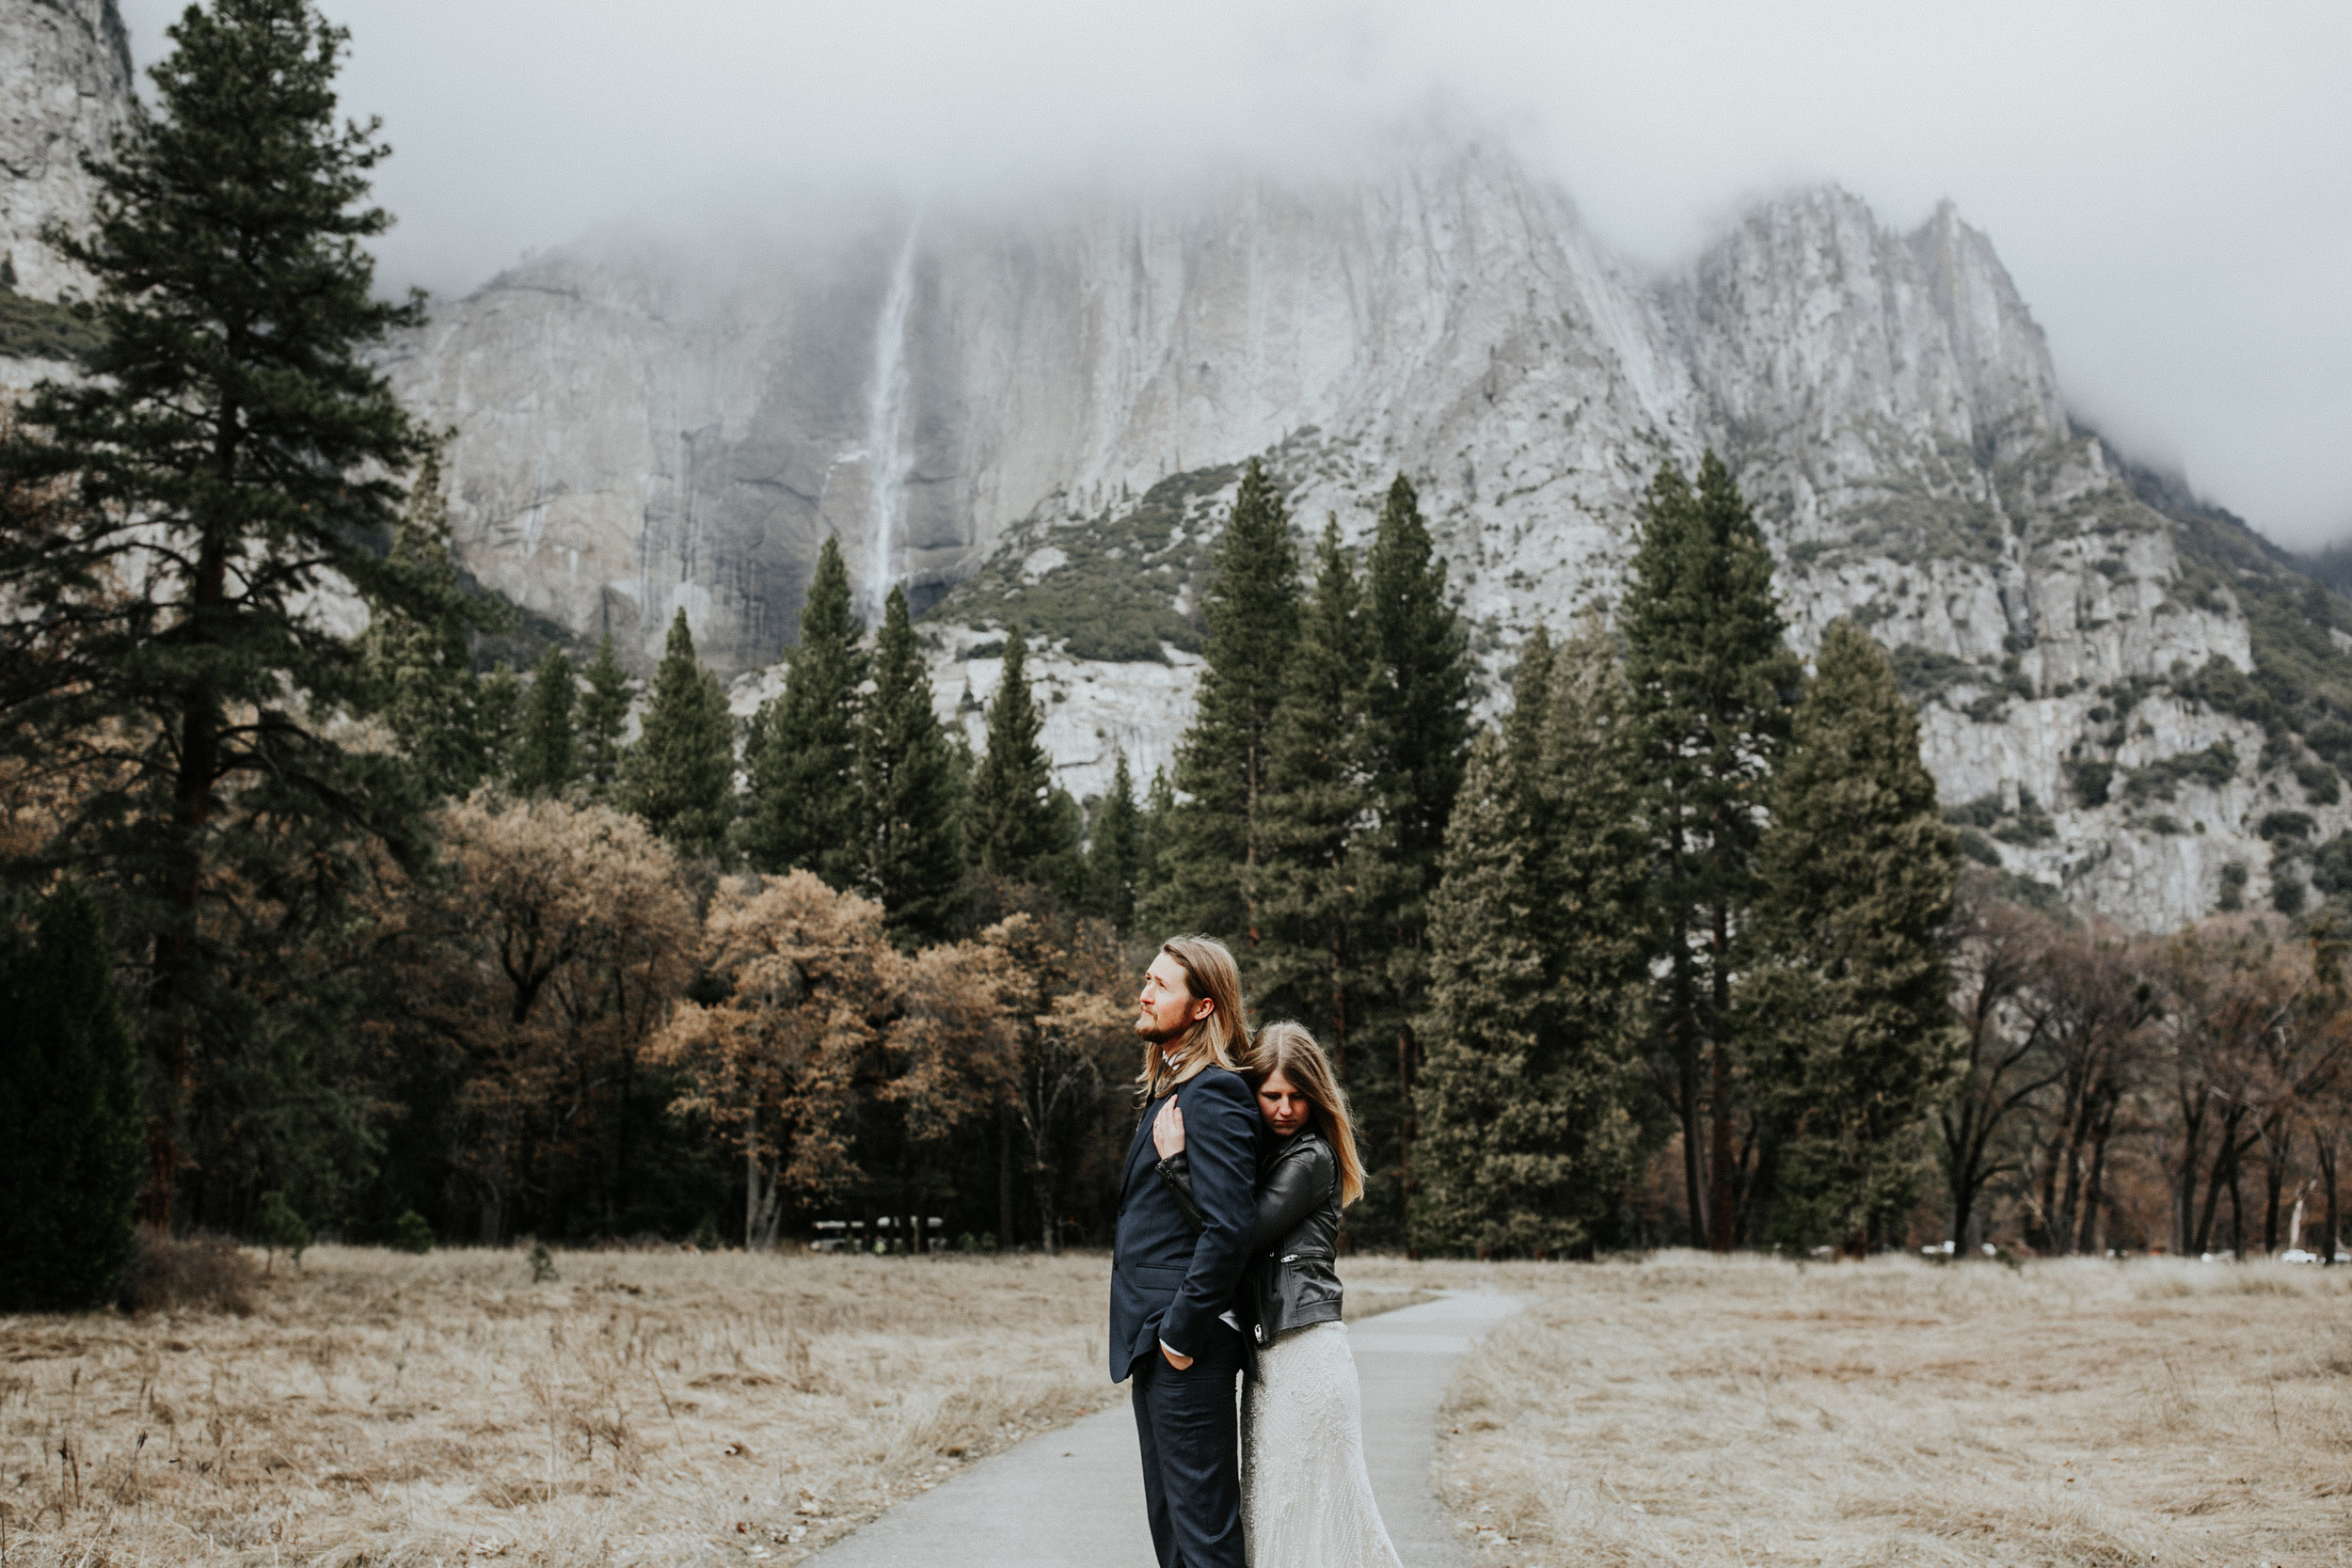 adventure-california-yosemite-photographer-grace-t-photography-72.jpg